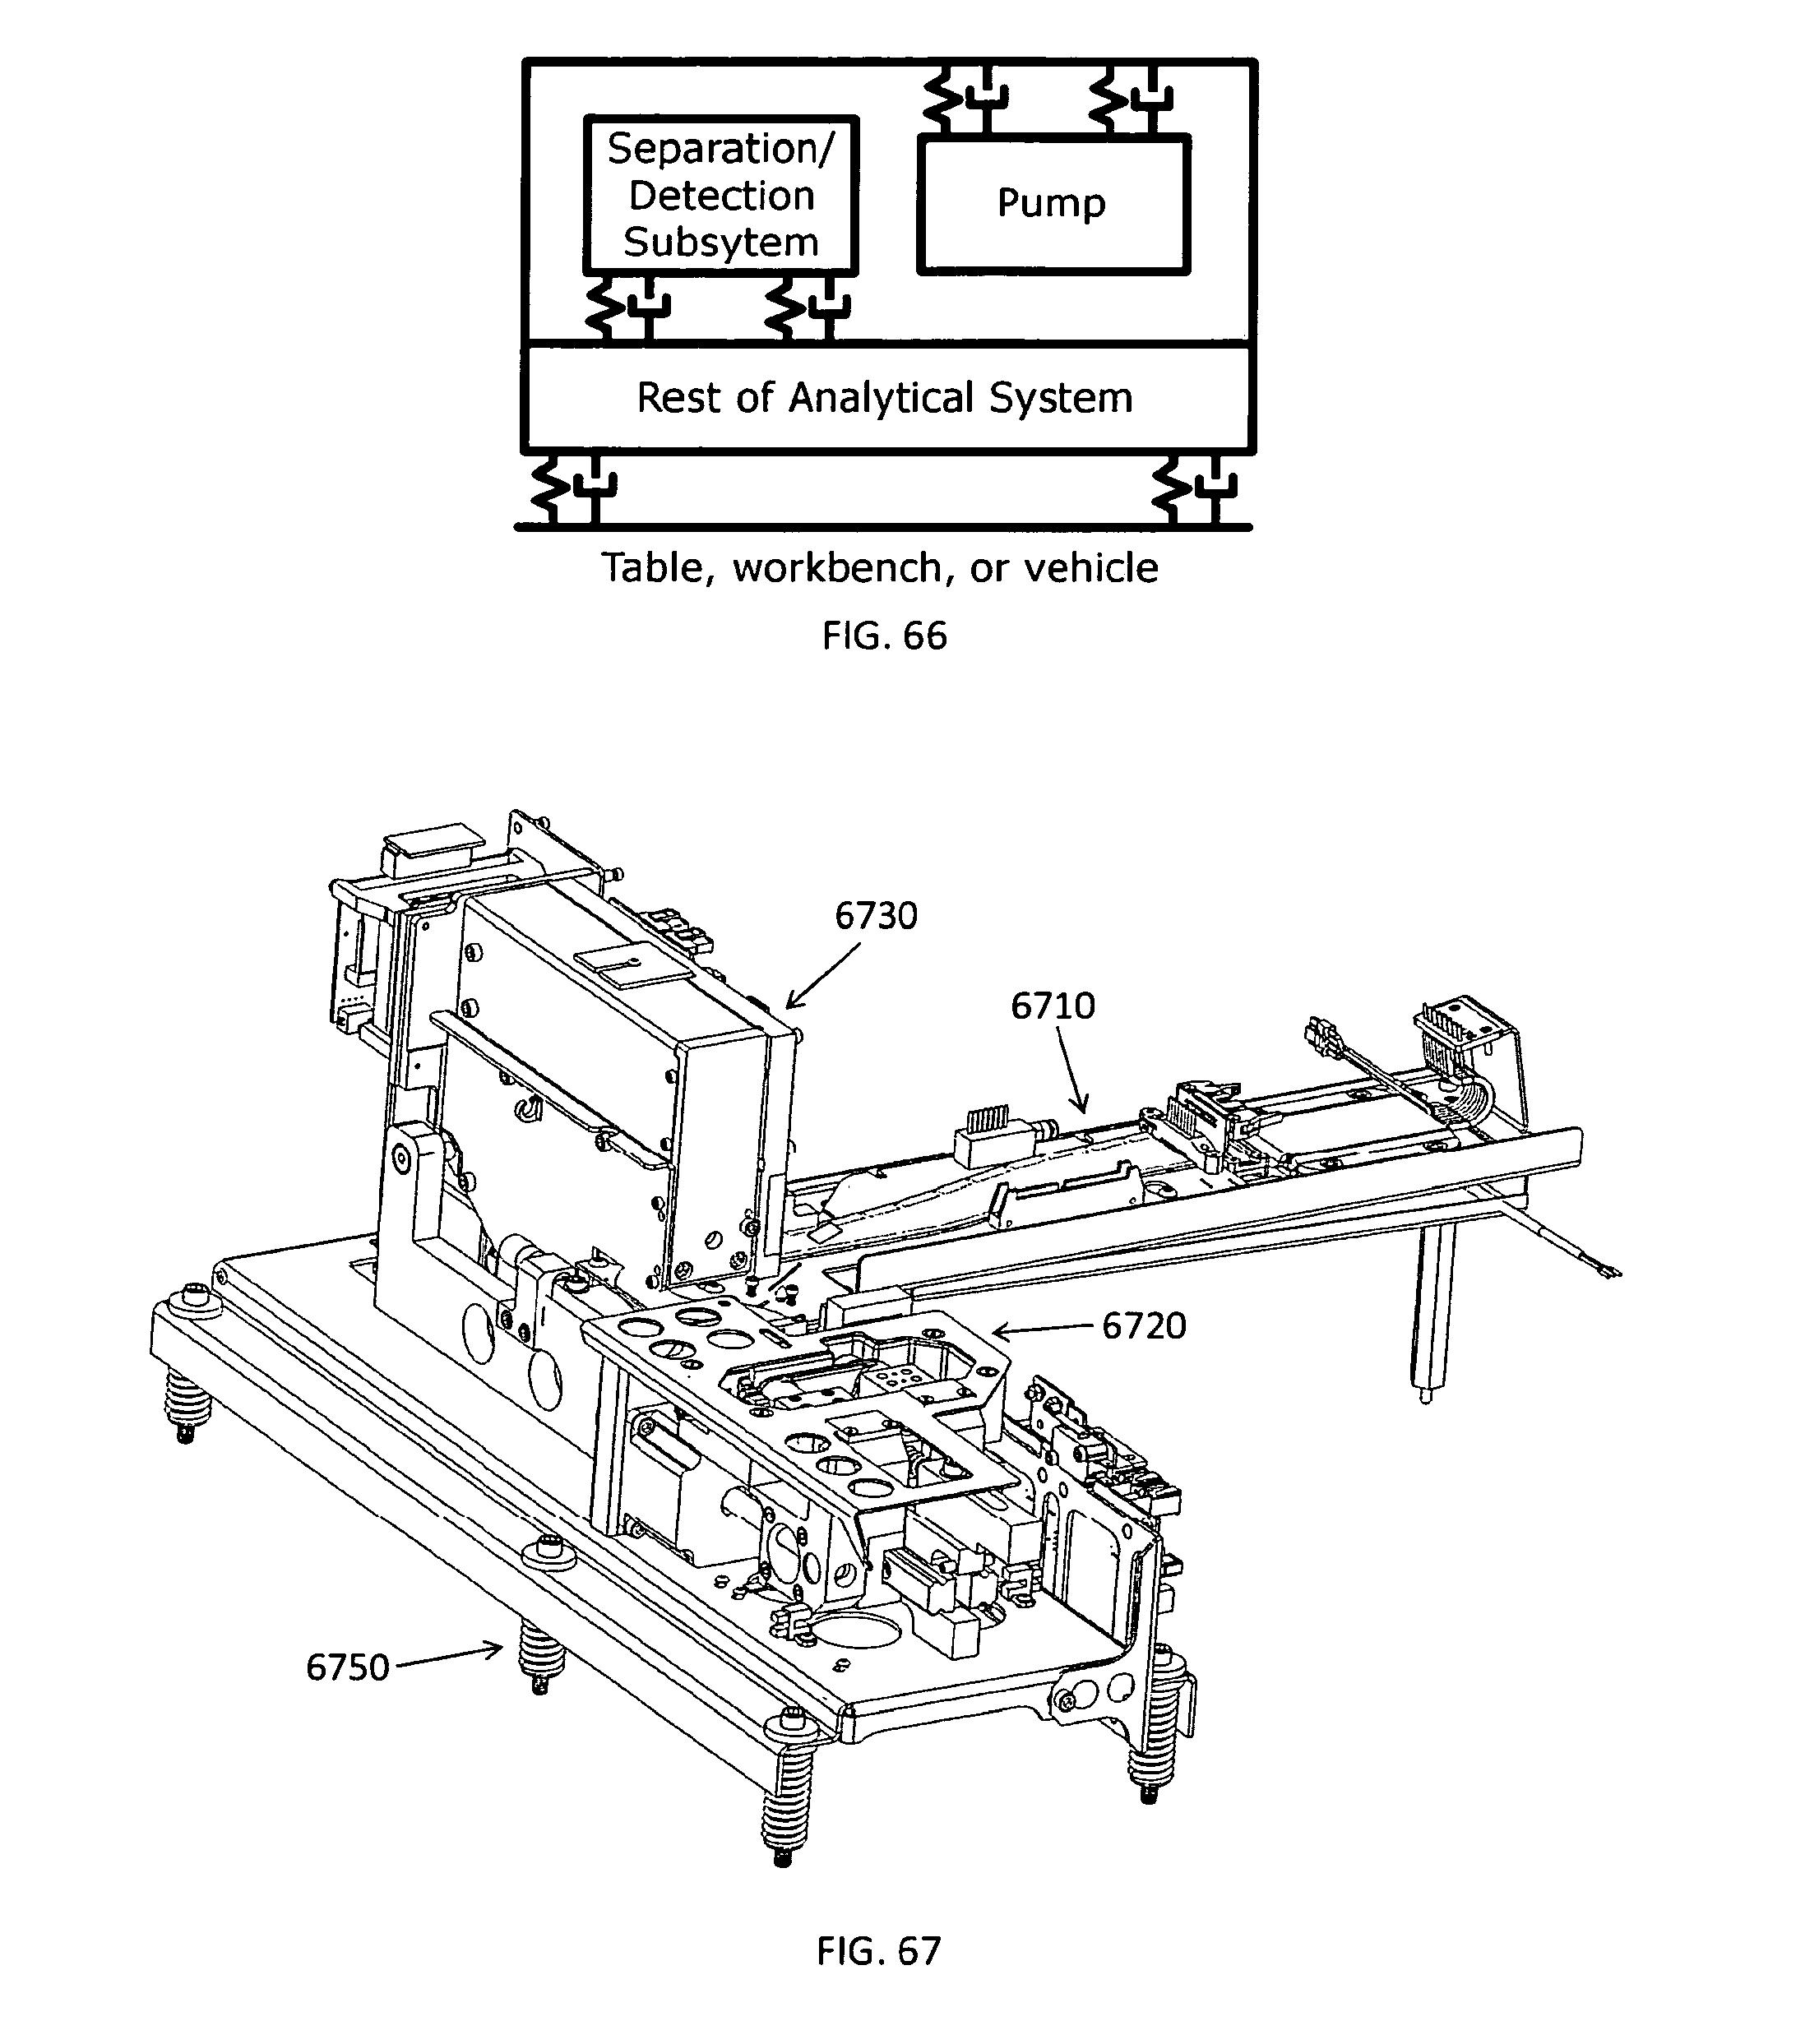 Patent US 20150024436A1